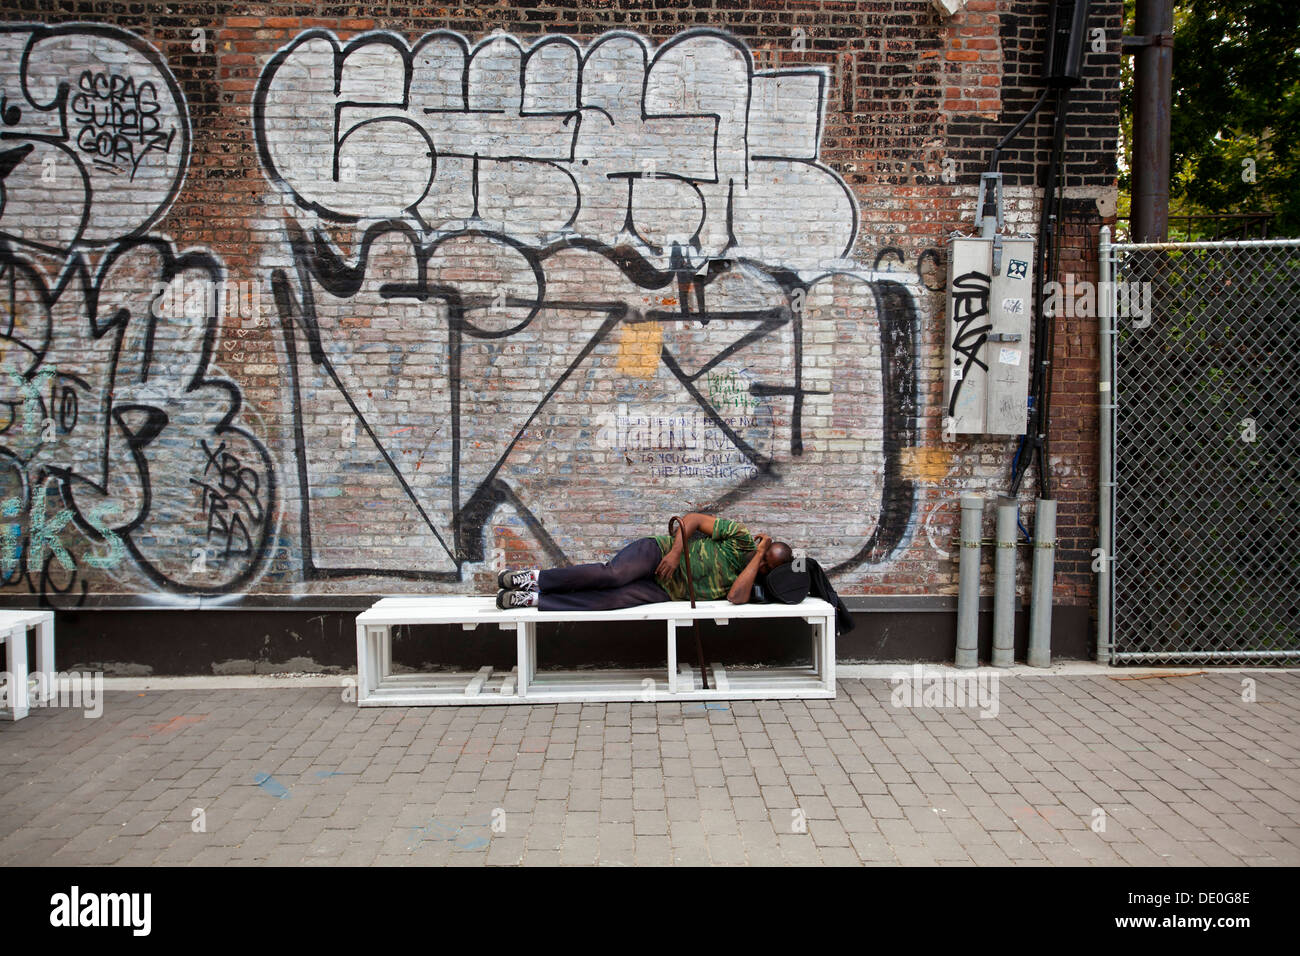 indigent sleeping, Street art on Houston Street, Manhattan, New York, United States of America - Stock Image